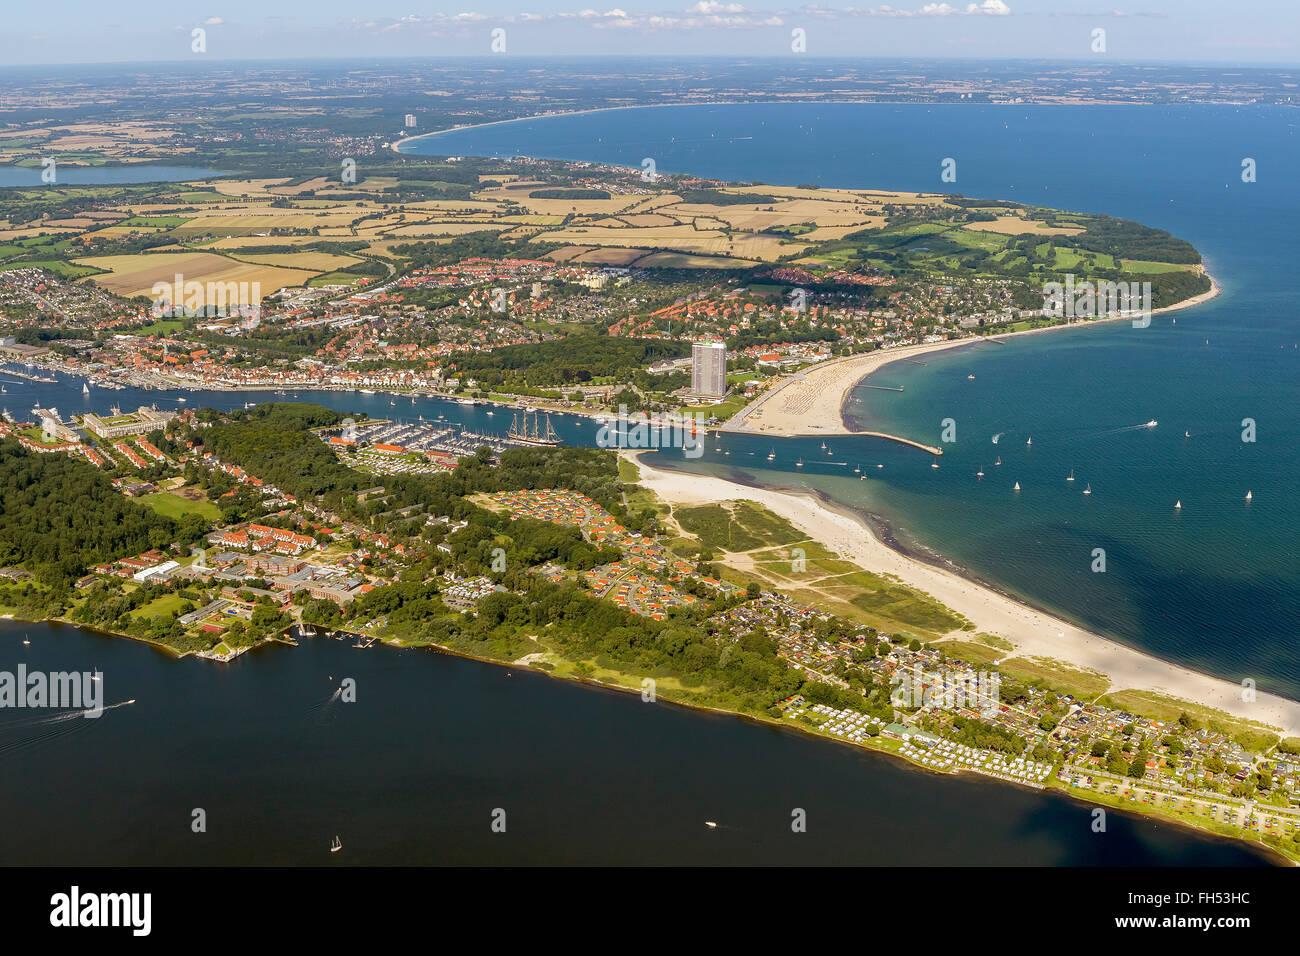 Aerial view, Travemünde, the Baltic resort Kiel Travemuende, Maritim Hotel, beach Hotel, Kiel, Baltic port, - Stock Image